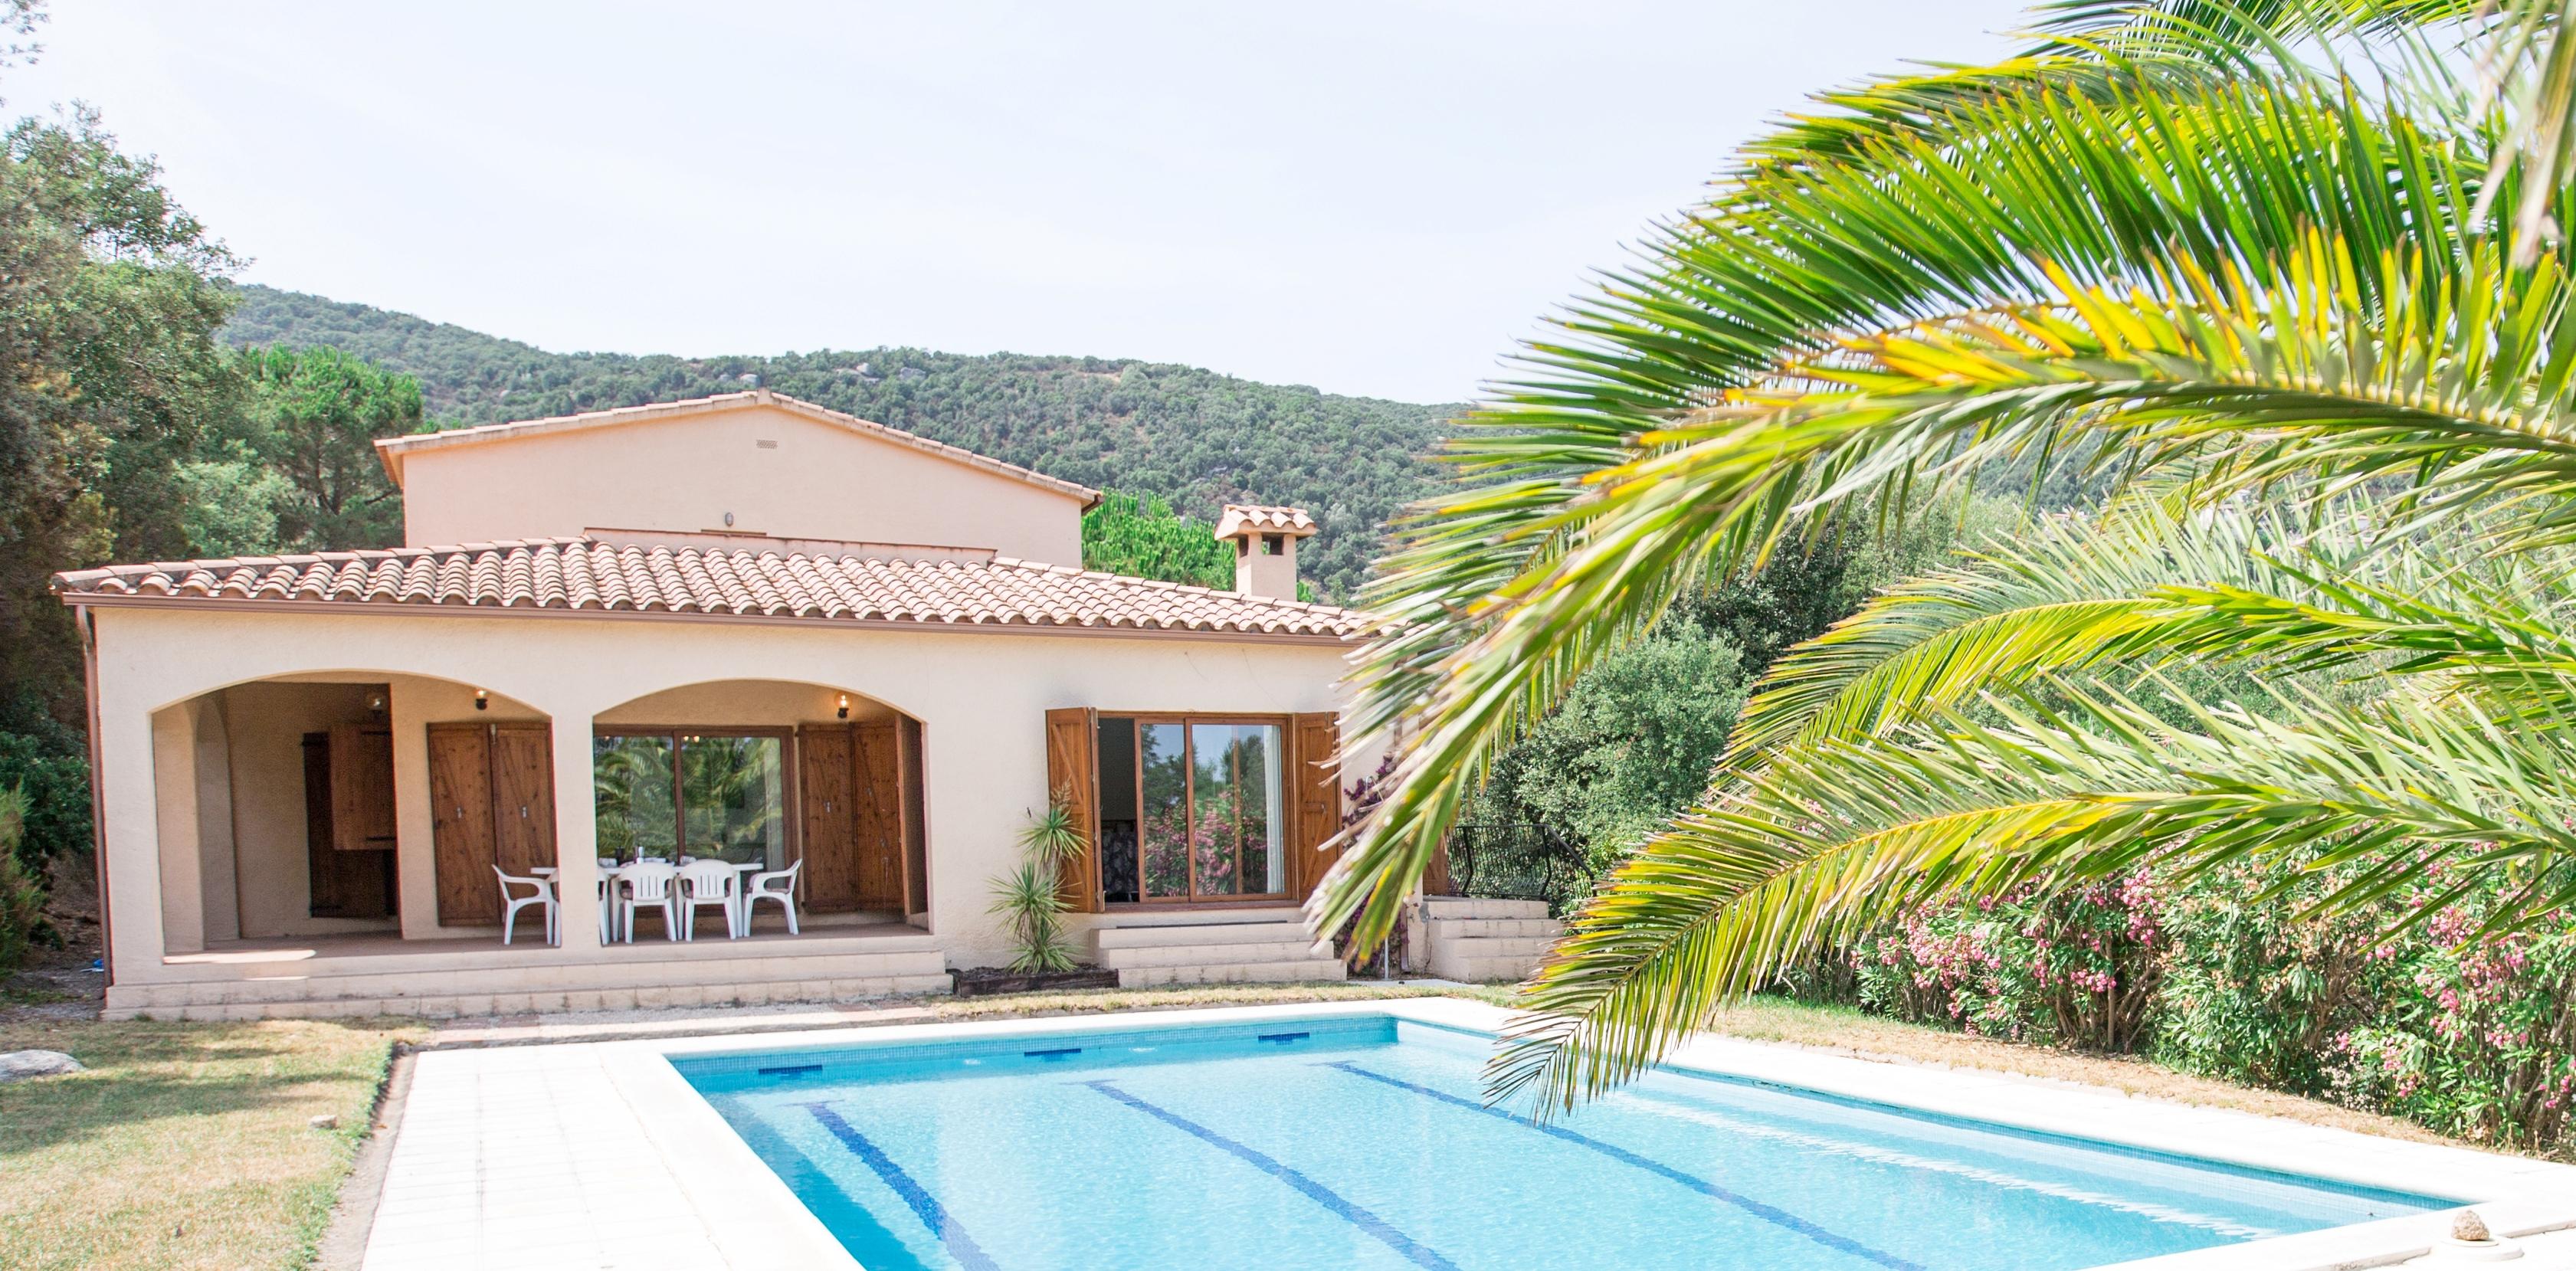 Maison De Vacances Mas Toi 1. Espagne » Costa Brava » Calonge